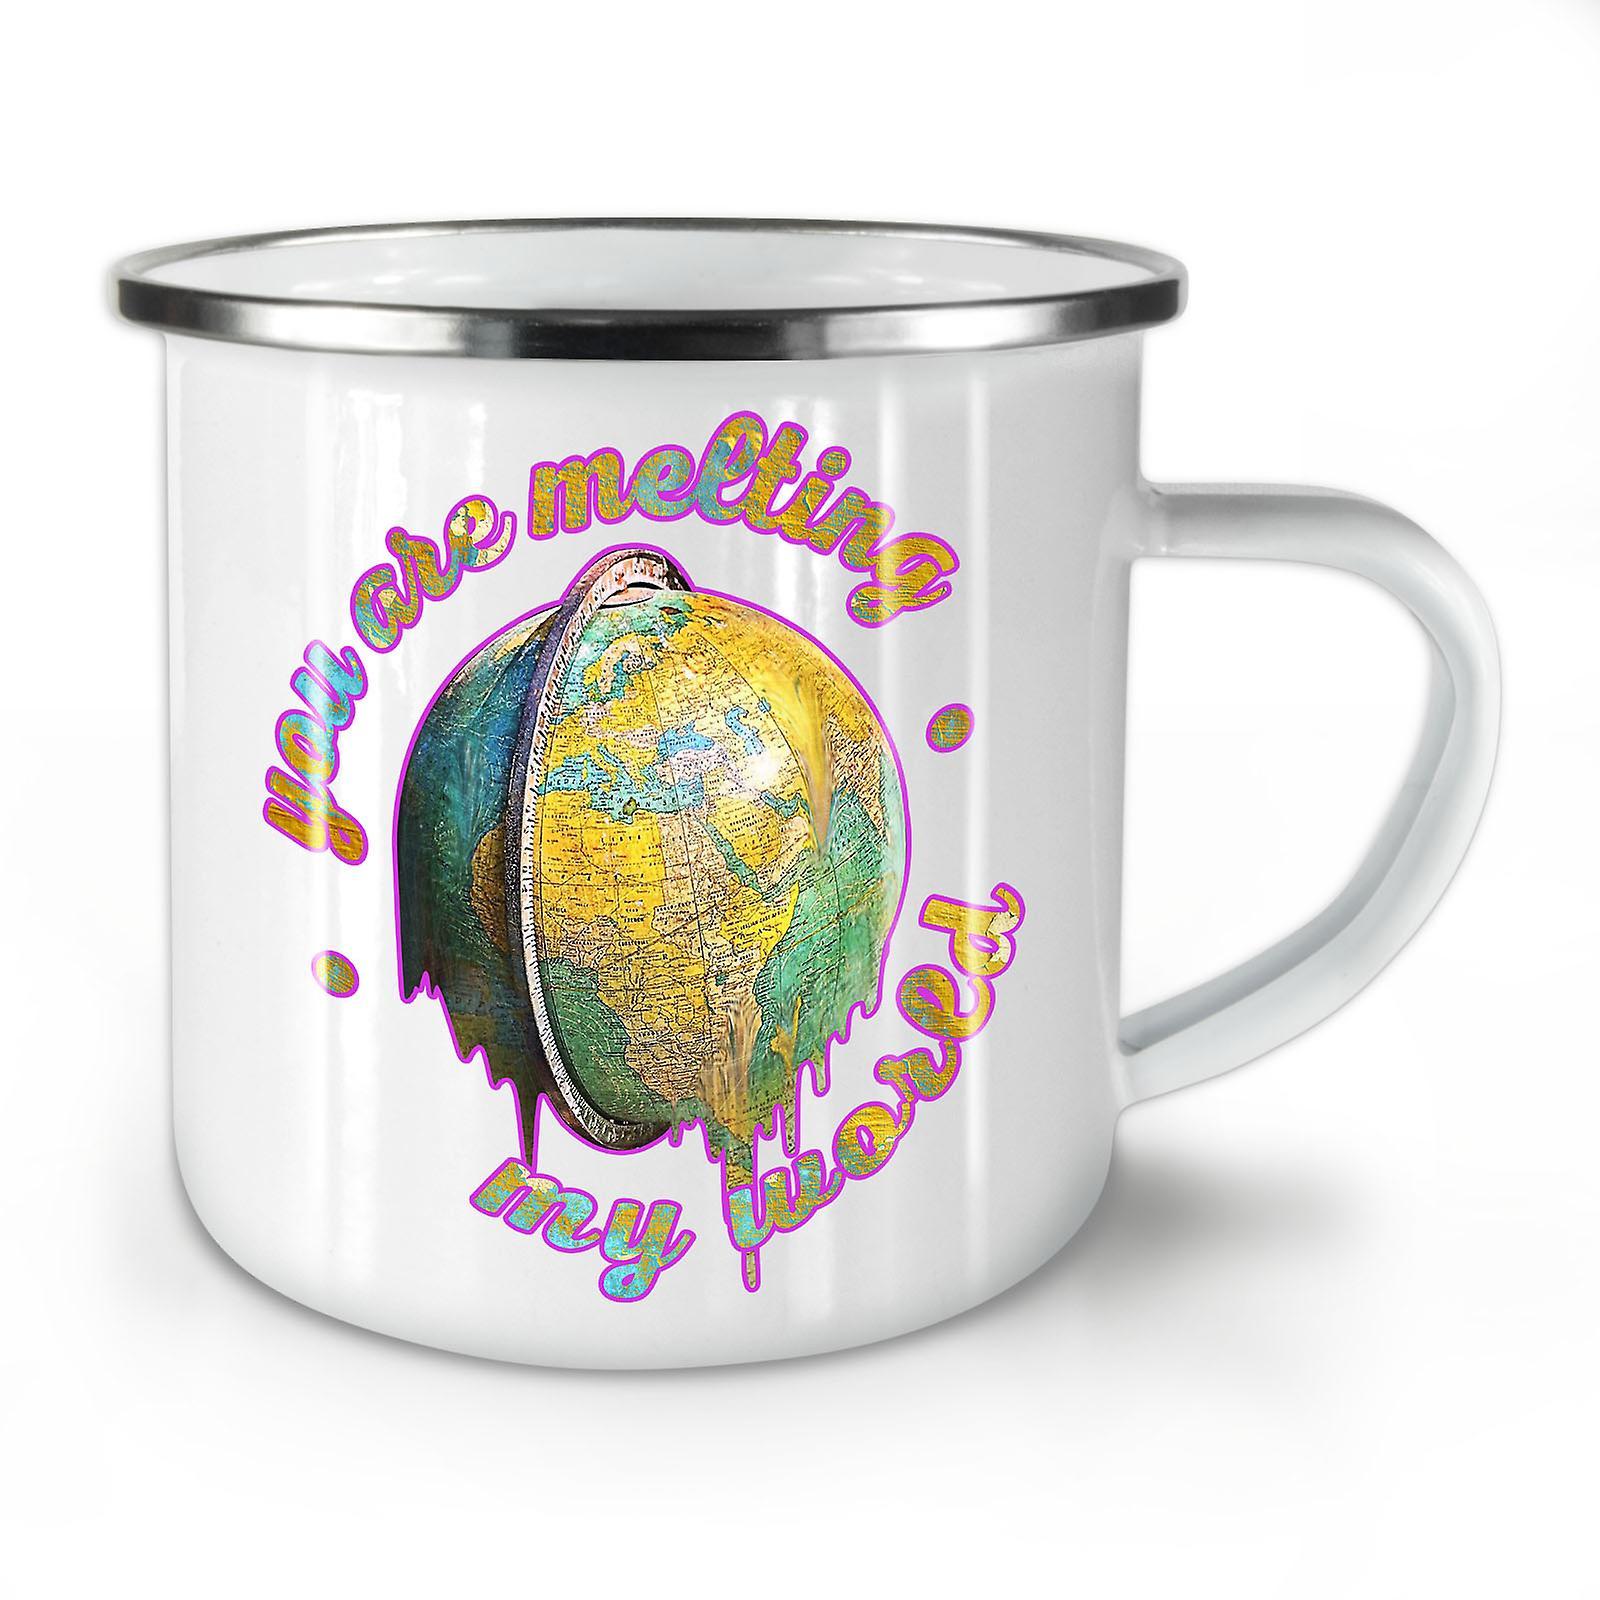 Monde Émail Whitetea Fondre Nouveau OzWellcoda Le Mignon Mug10 Café XZkuOPi